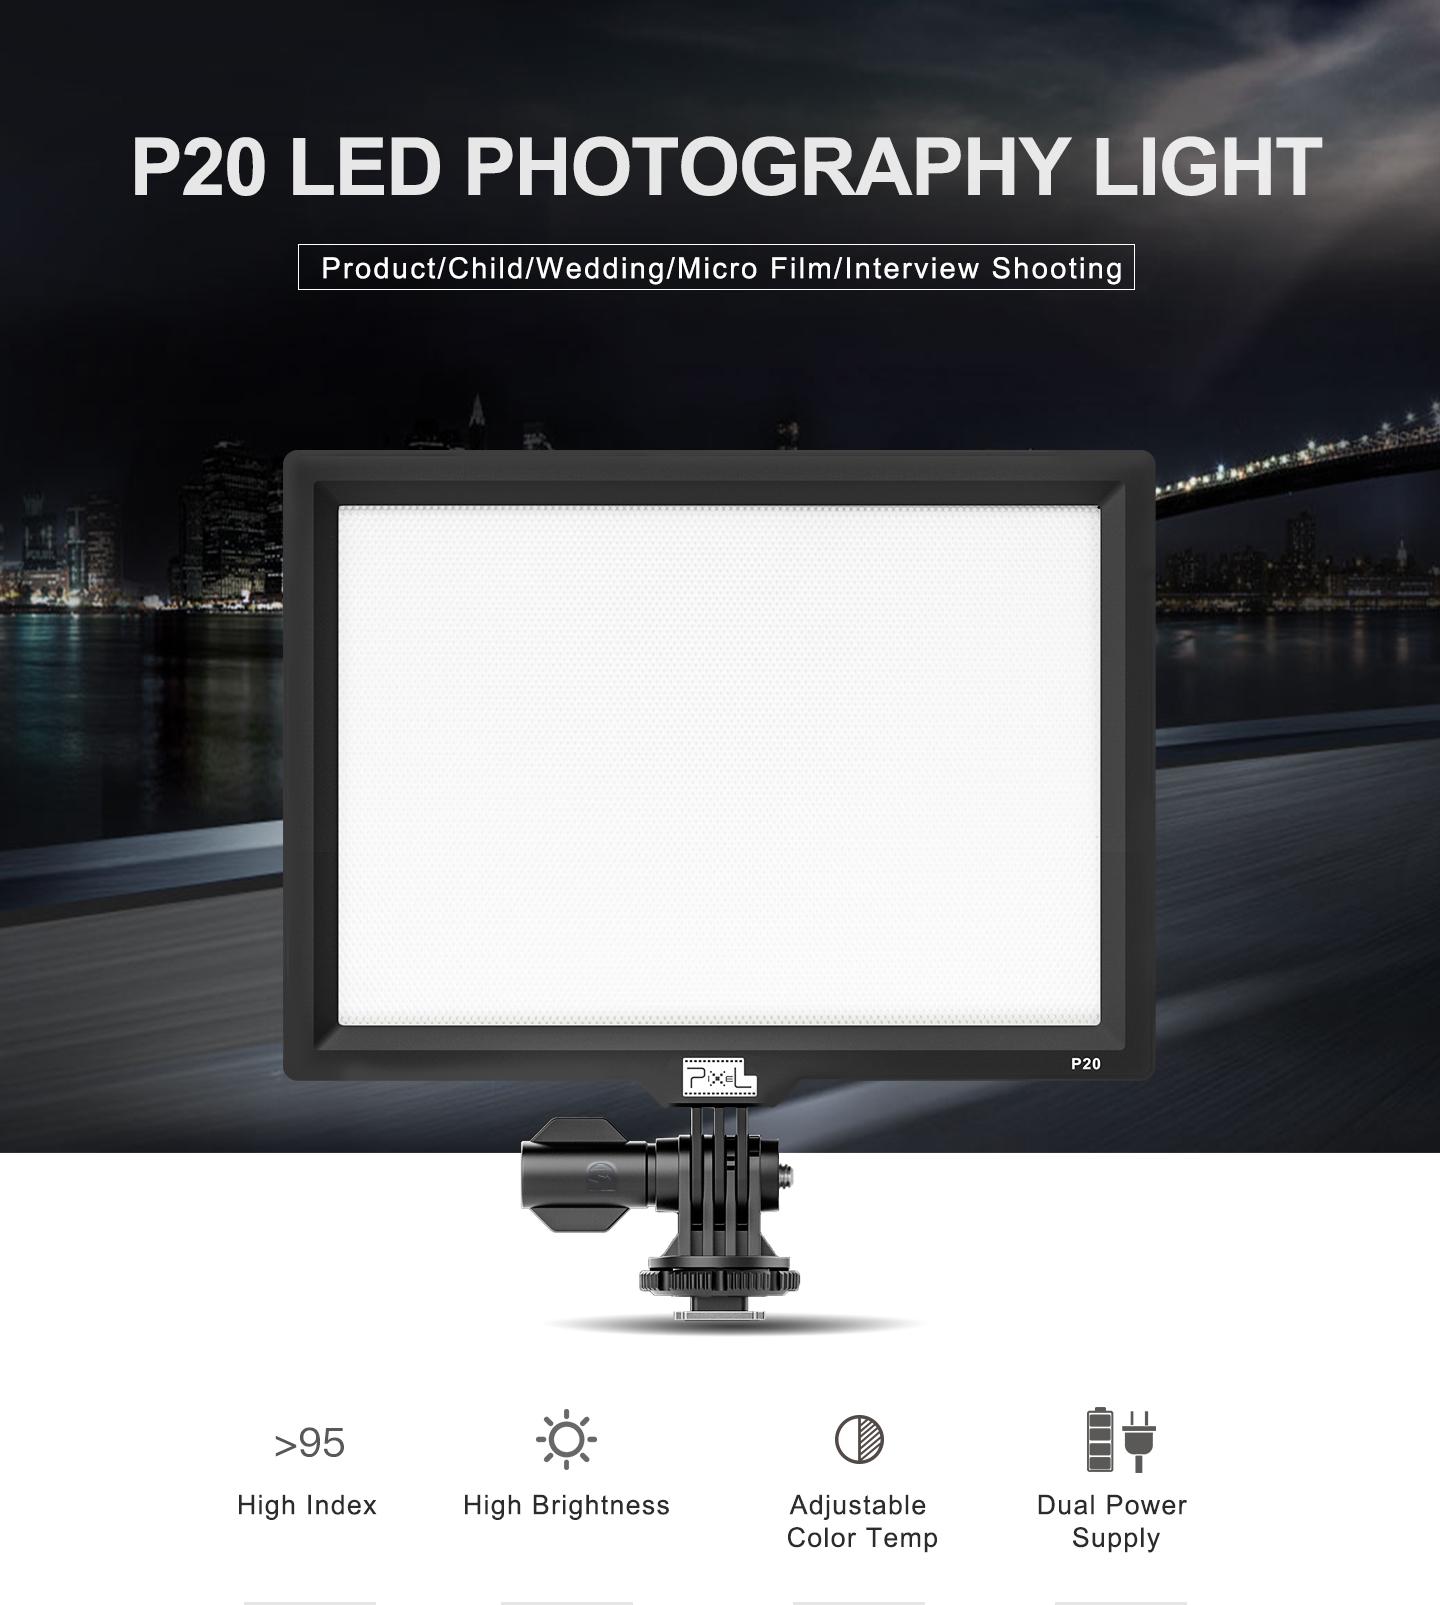 P20 LED PHOTOGRAPHY LIGHT